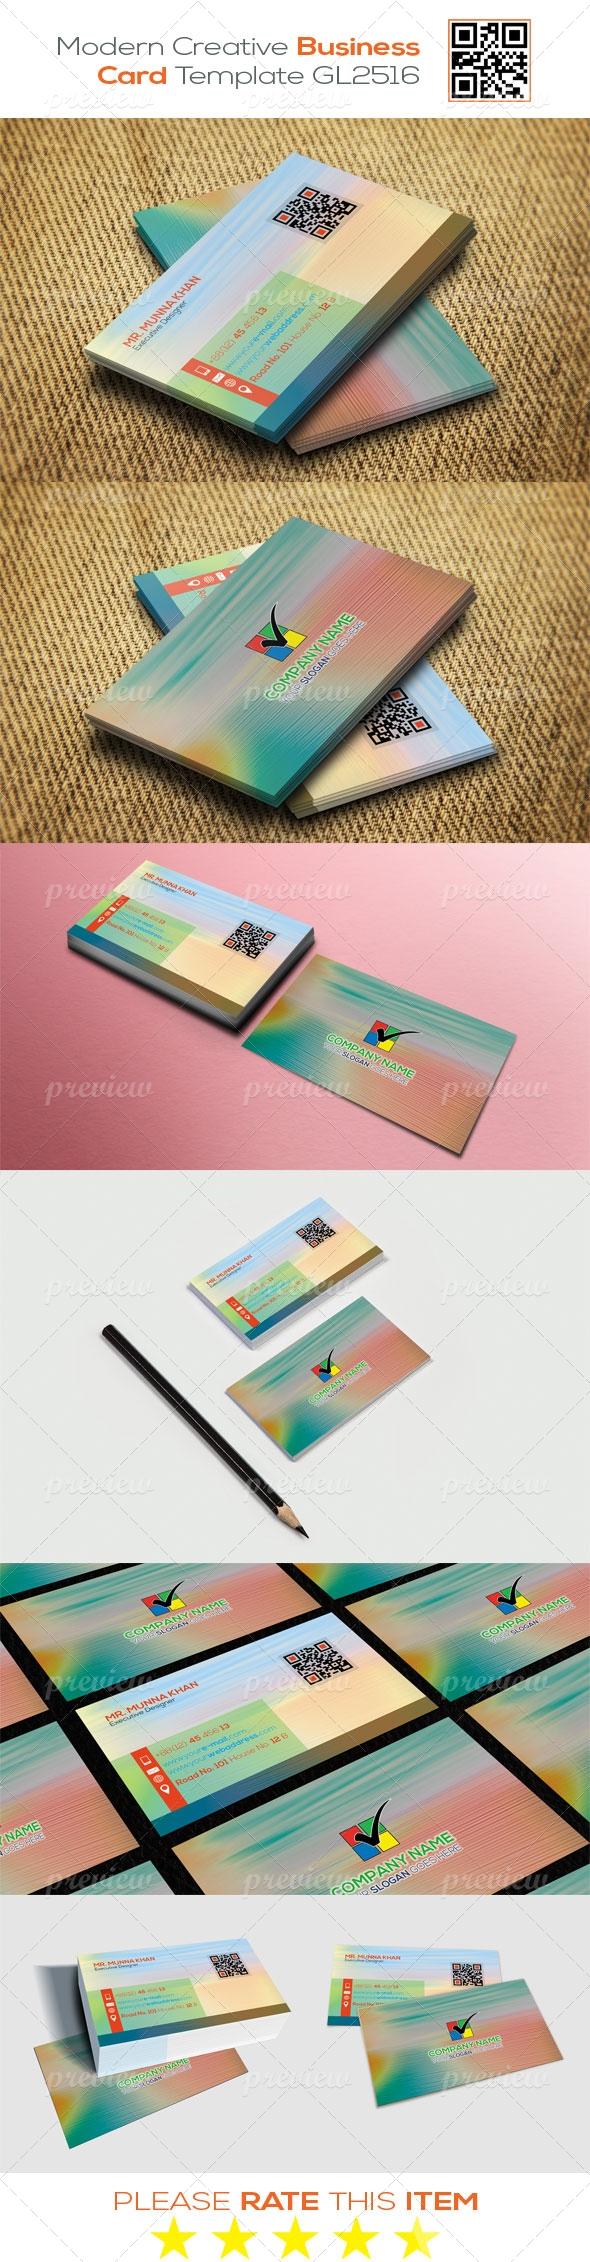 Modern Creative Business Card Template GL2516